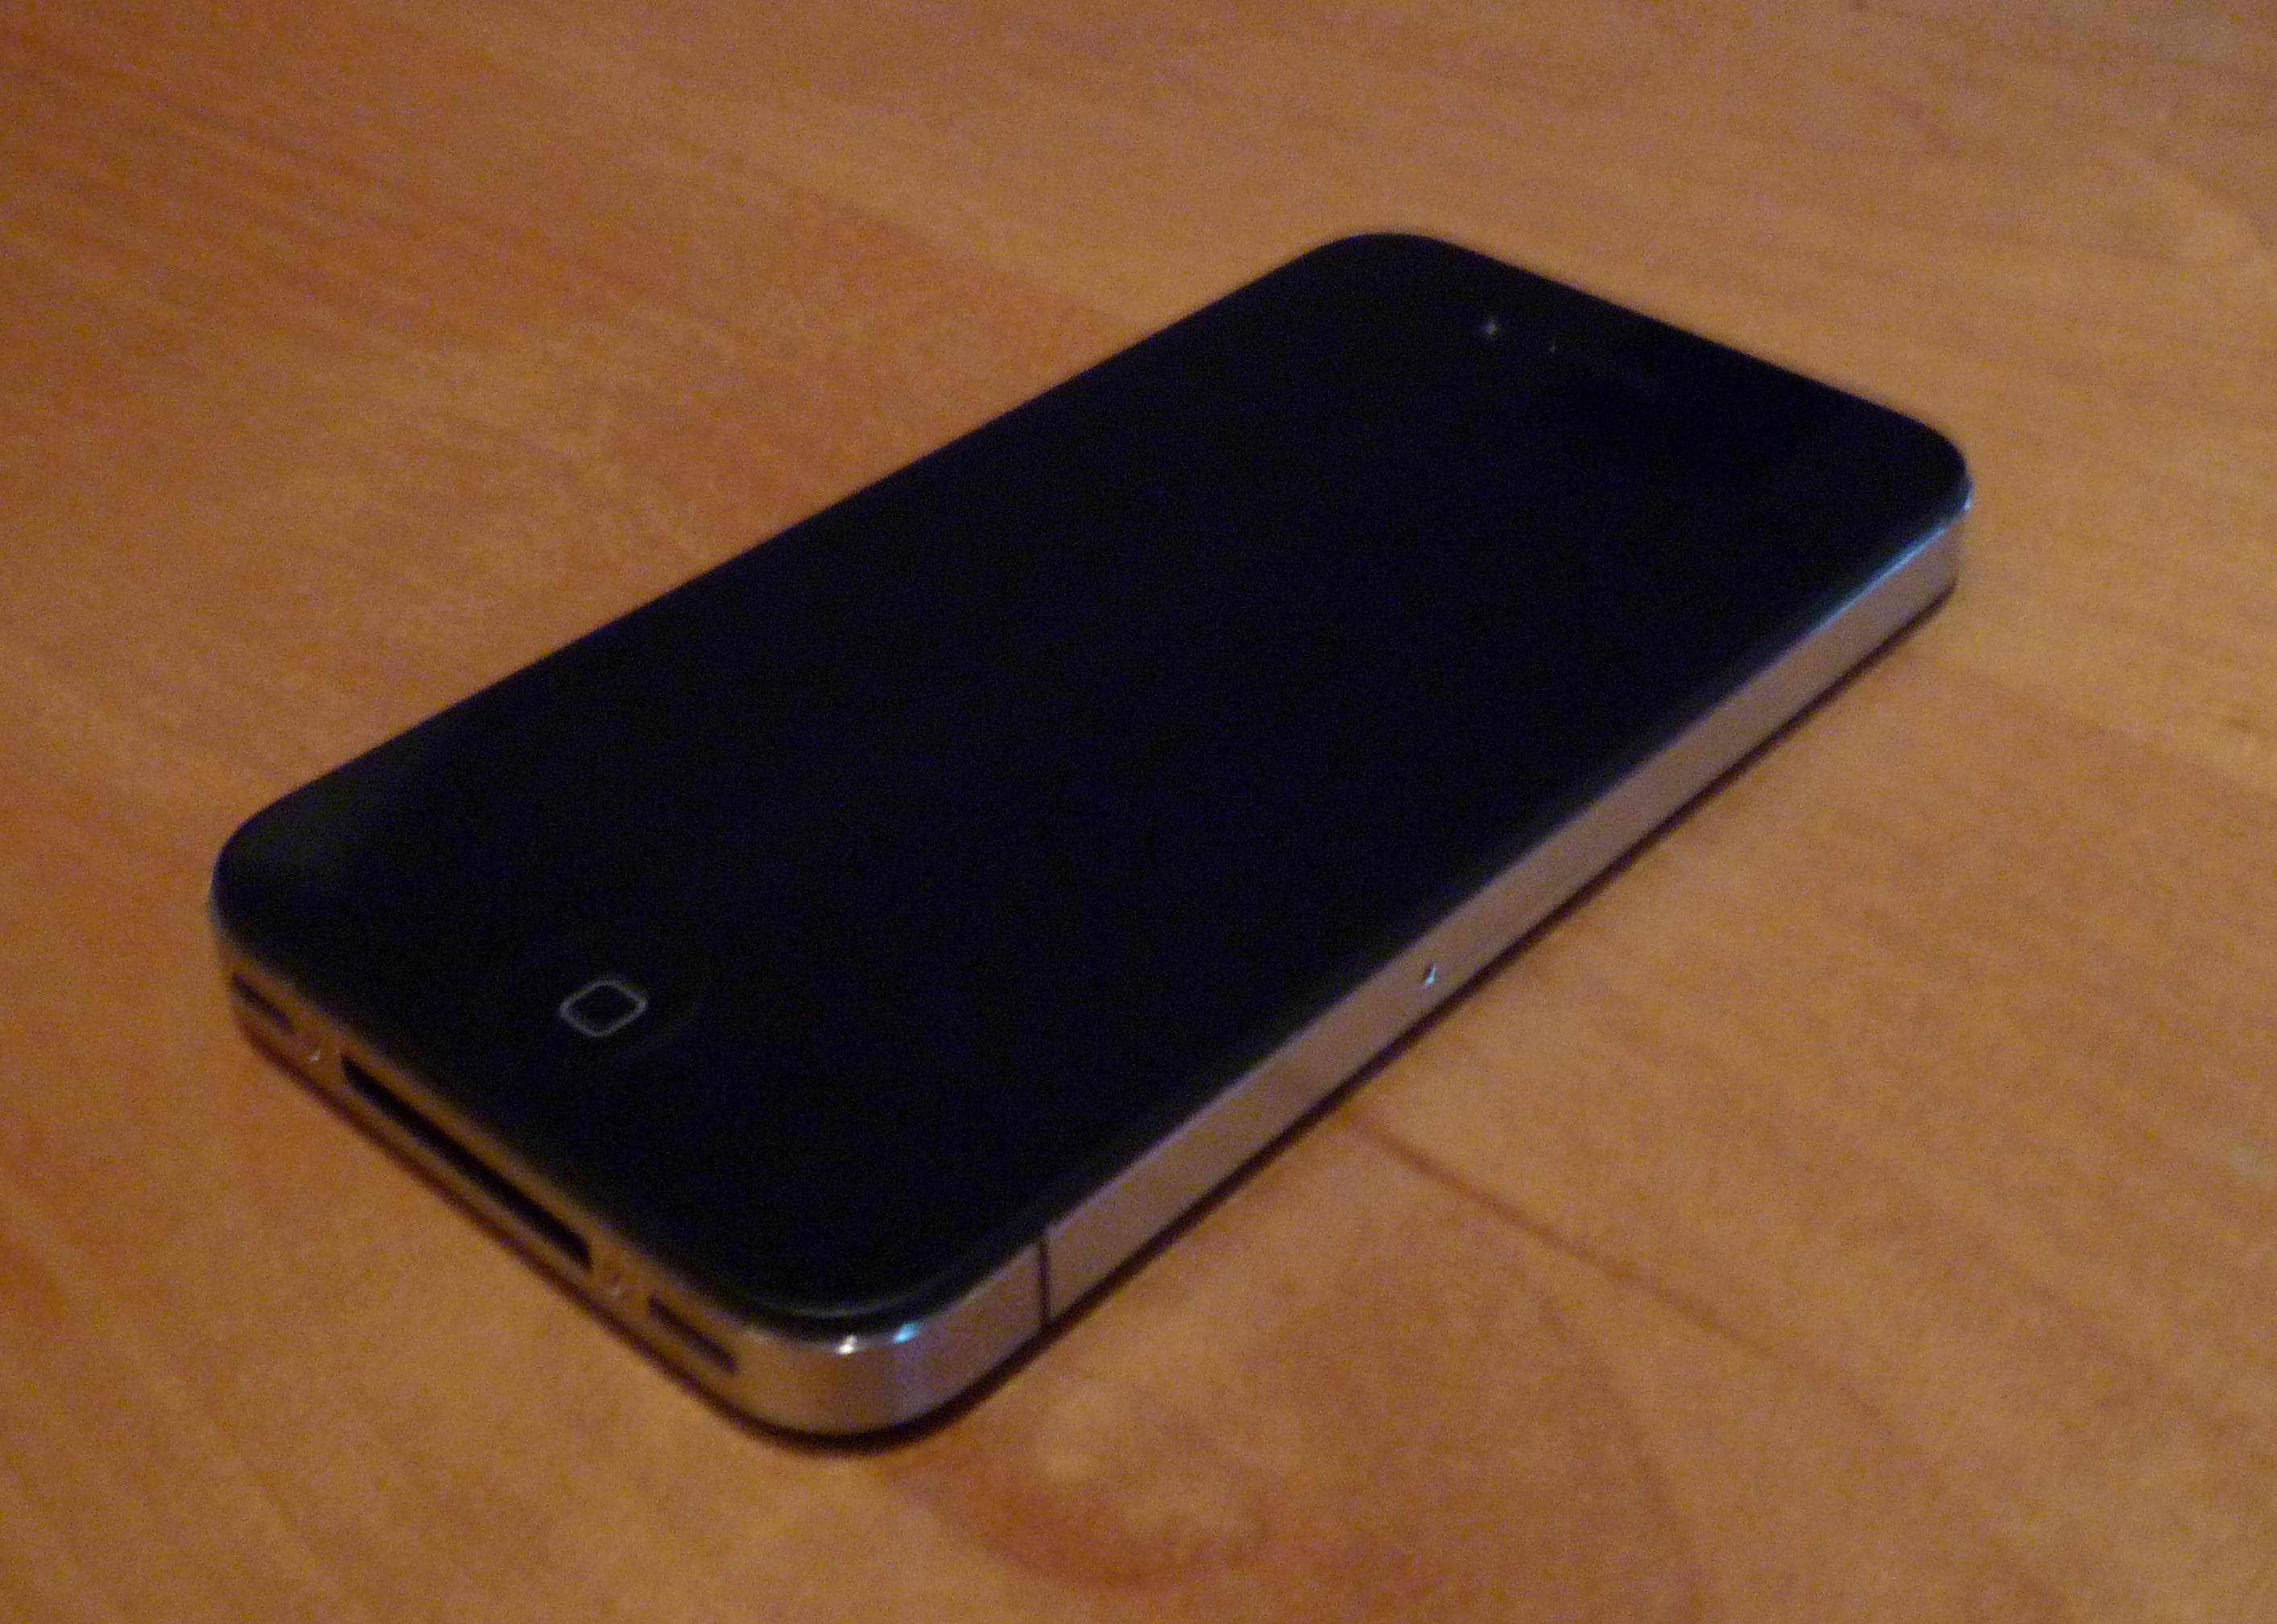 Black iPhone 4 16gb model. In great working condition | nukleus ...